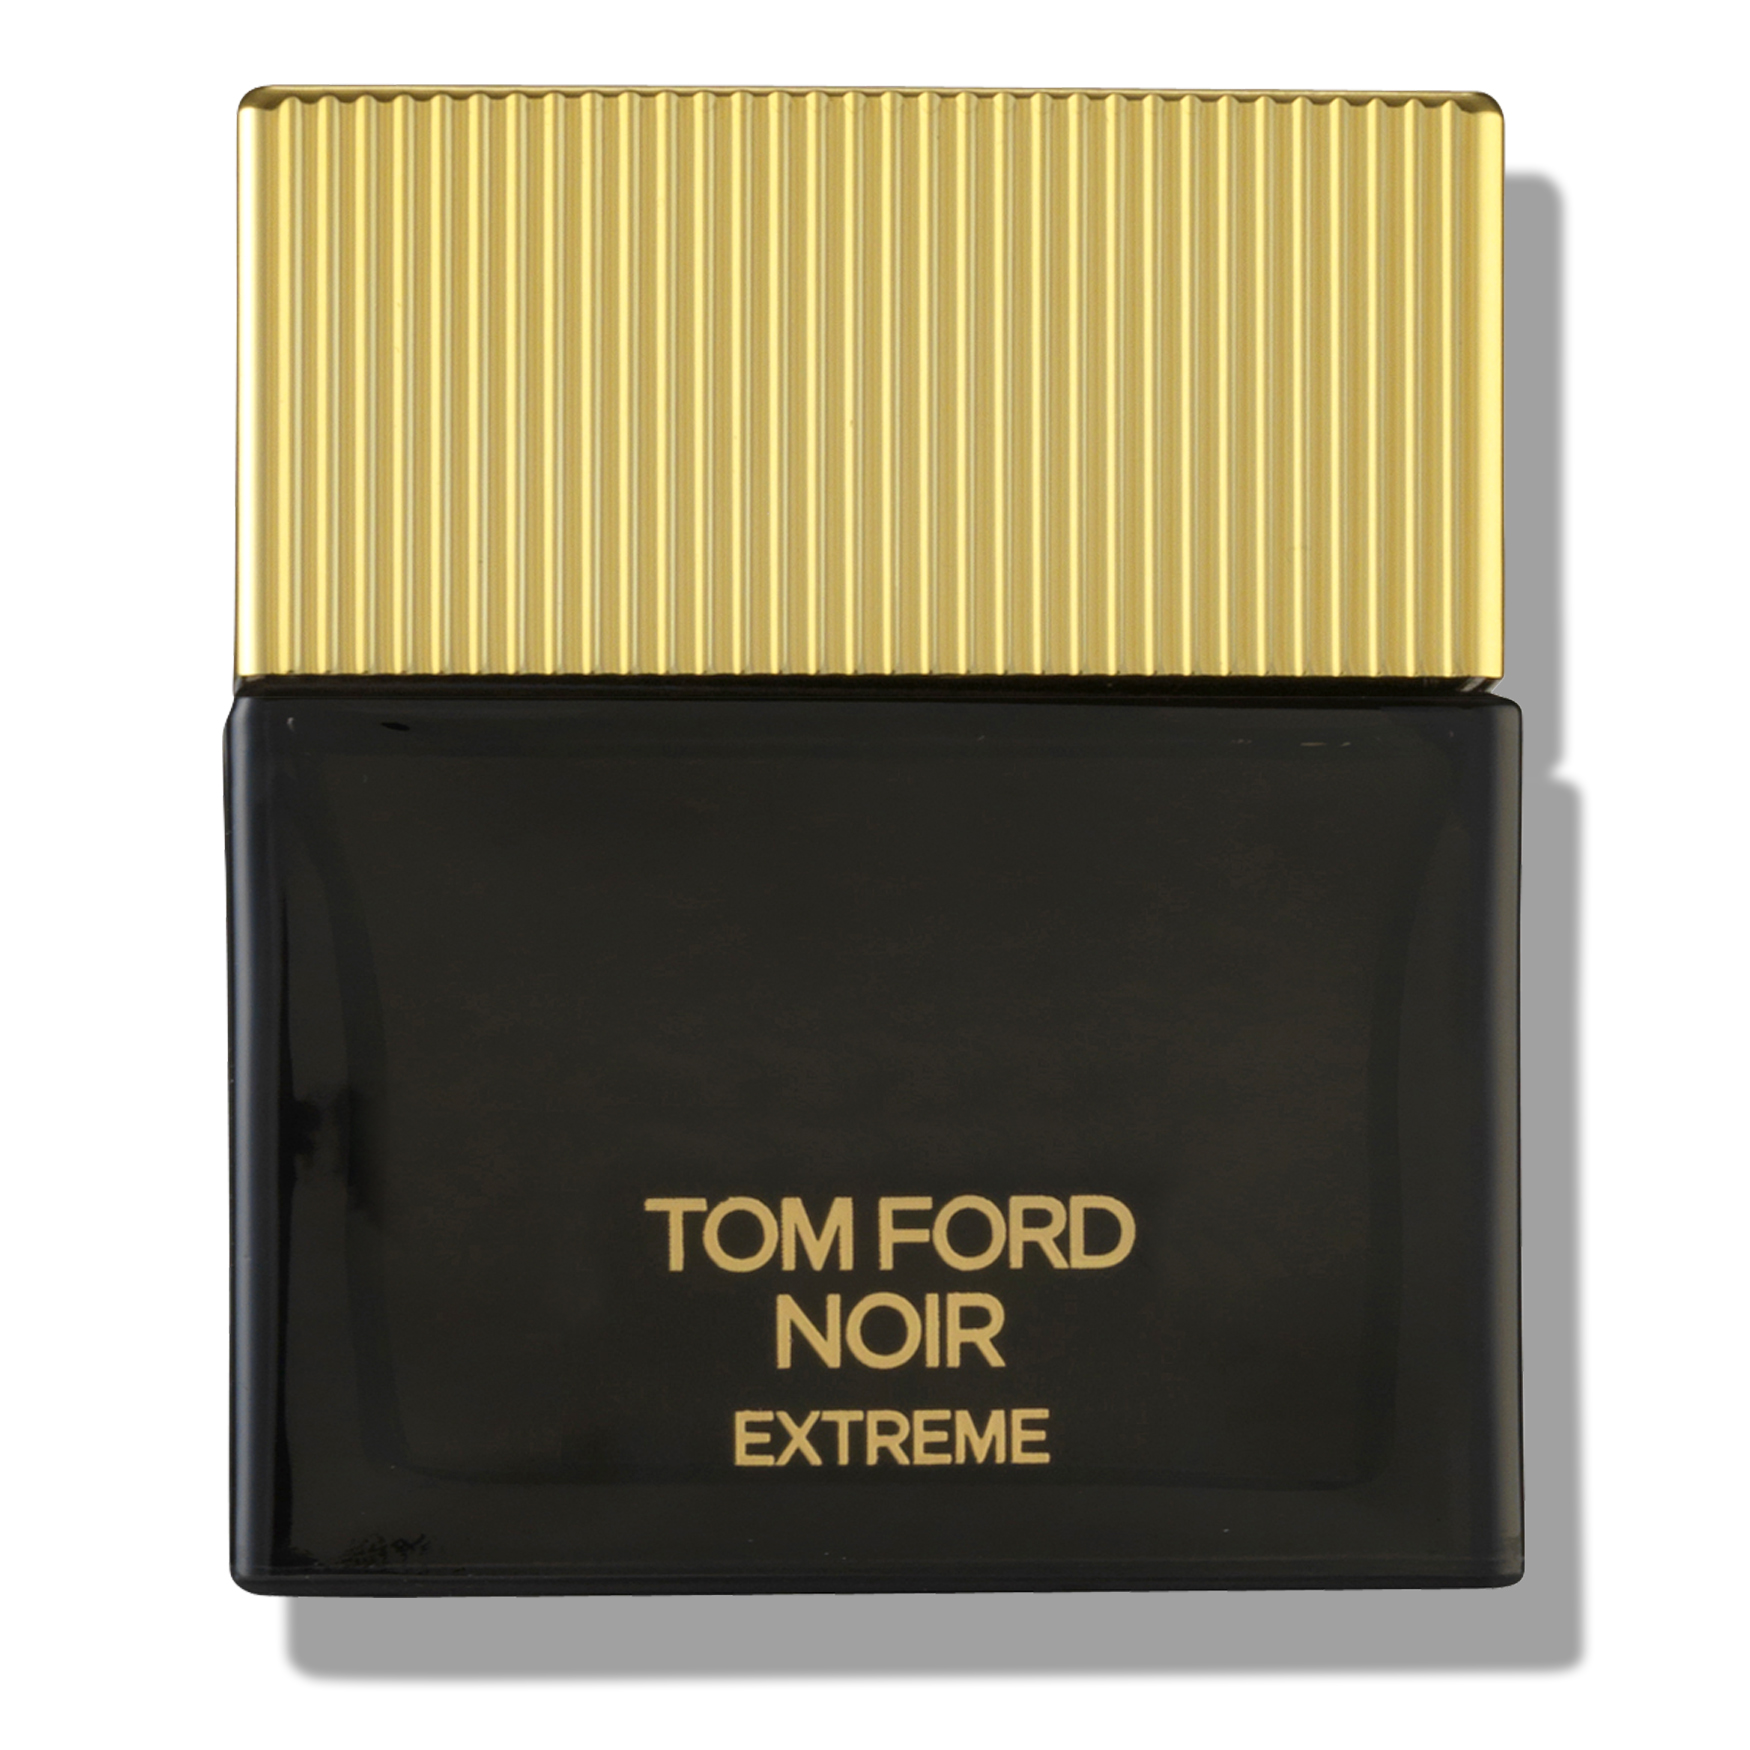 Tom Ford Noir Extreme, , large